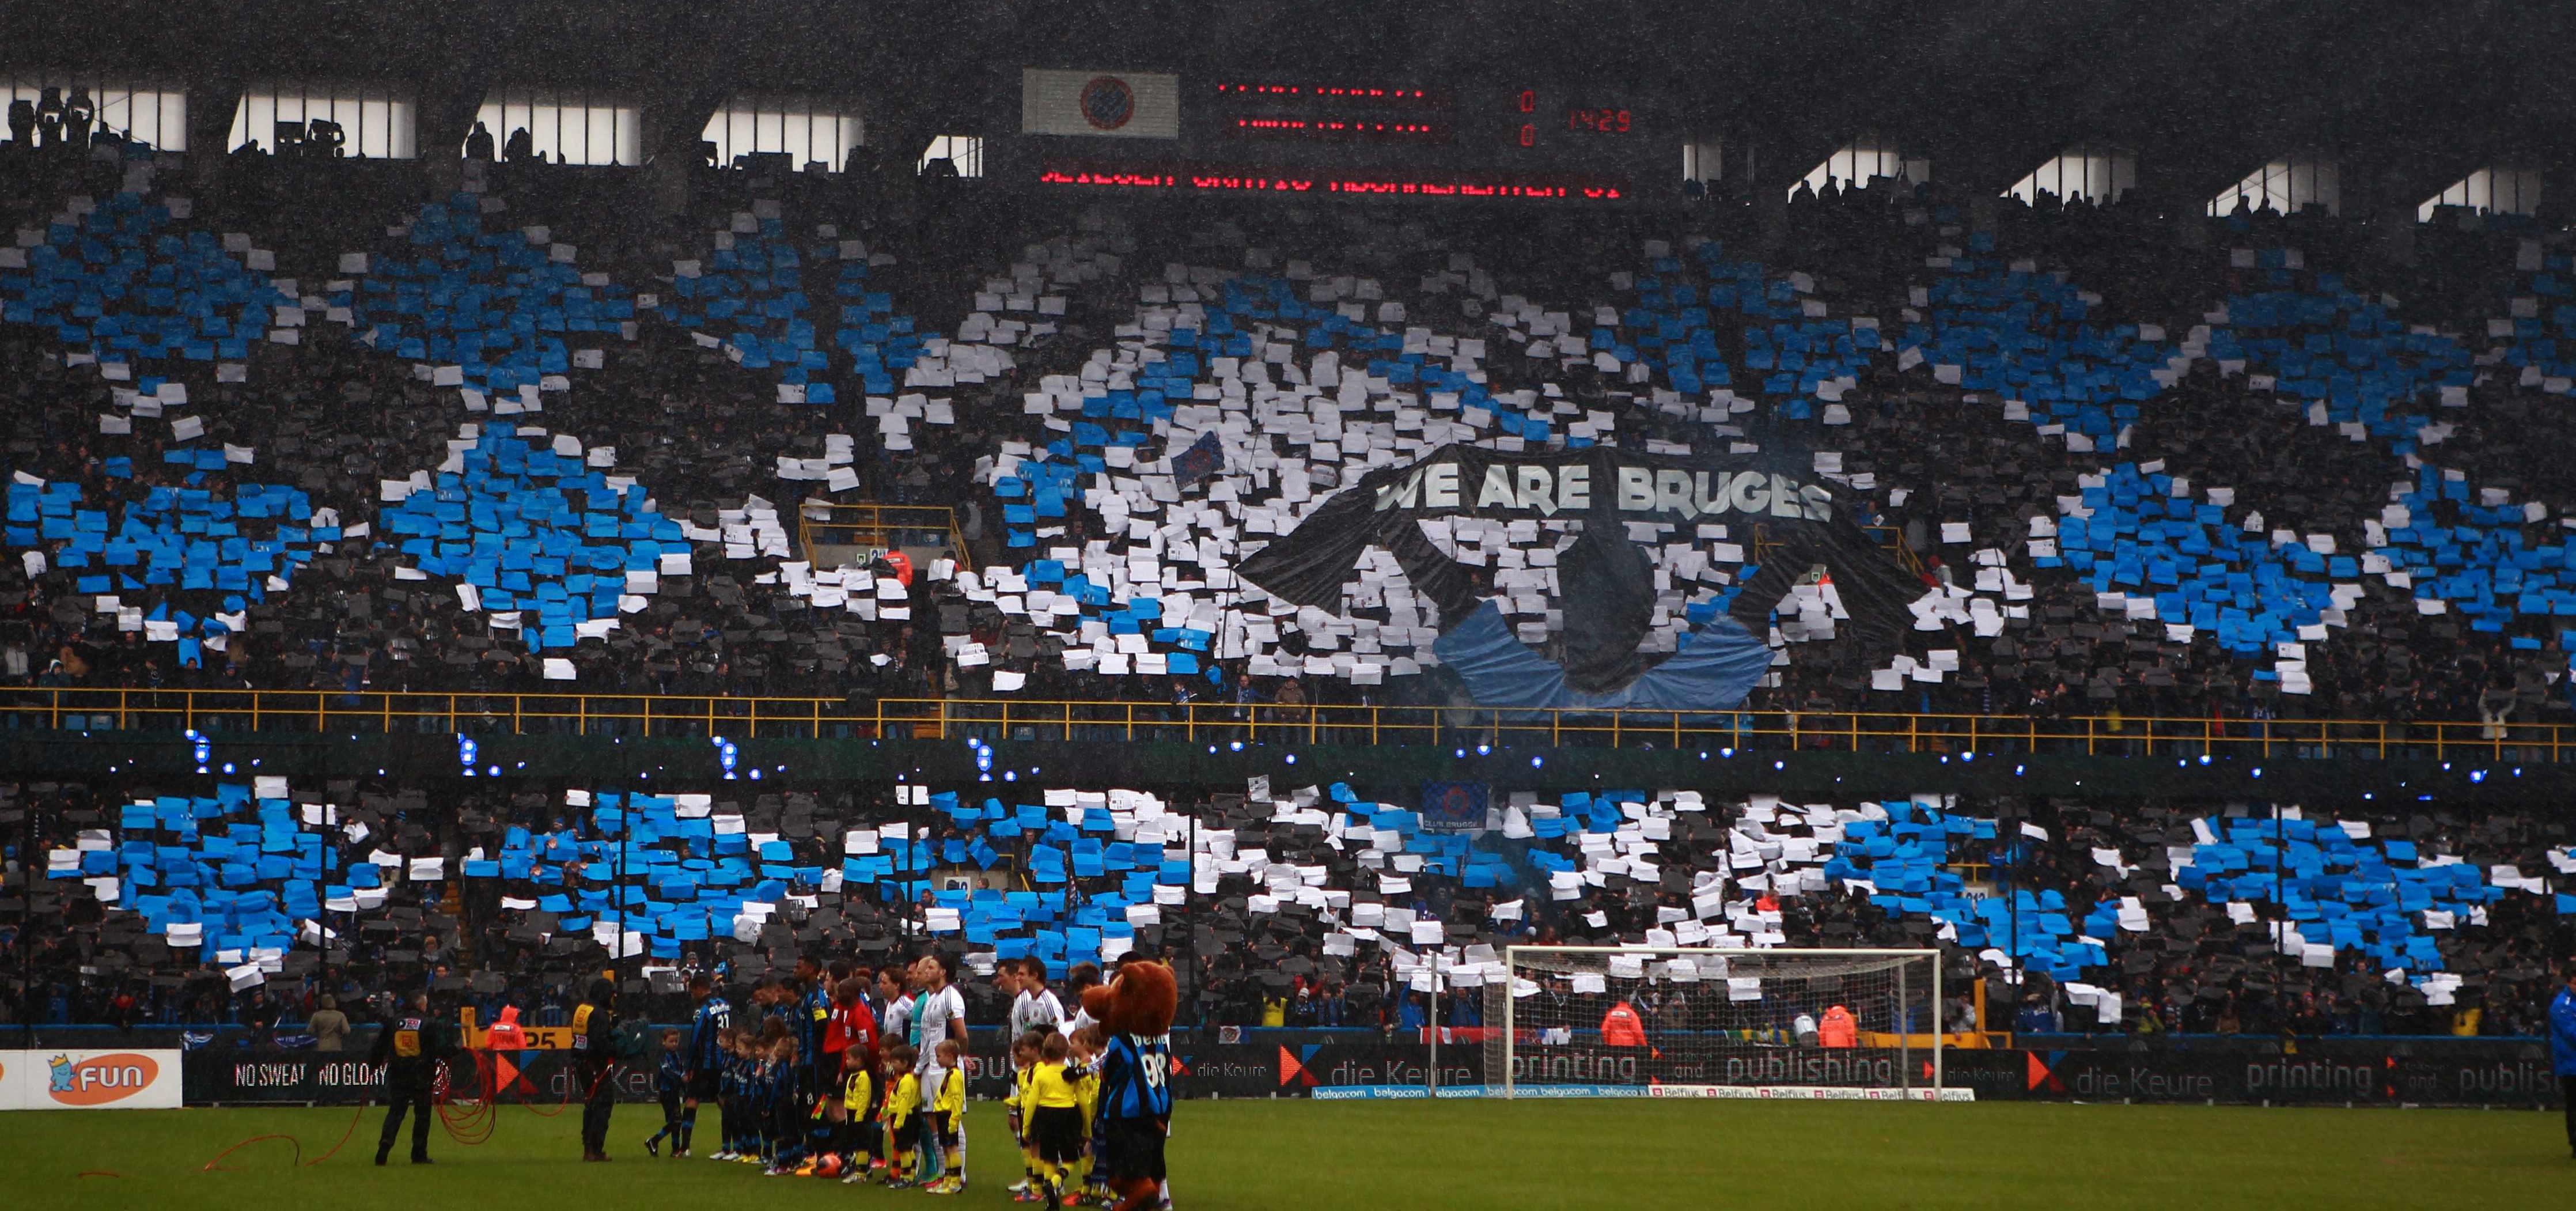 Club Brugge - RSC Anderlecht - 19-20